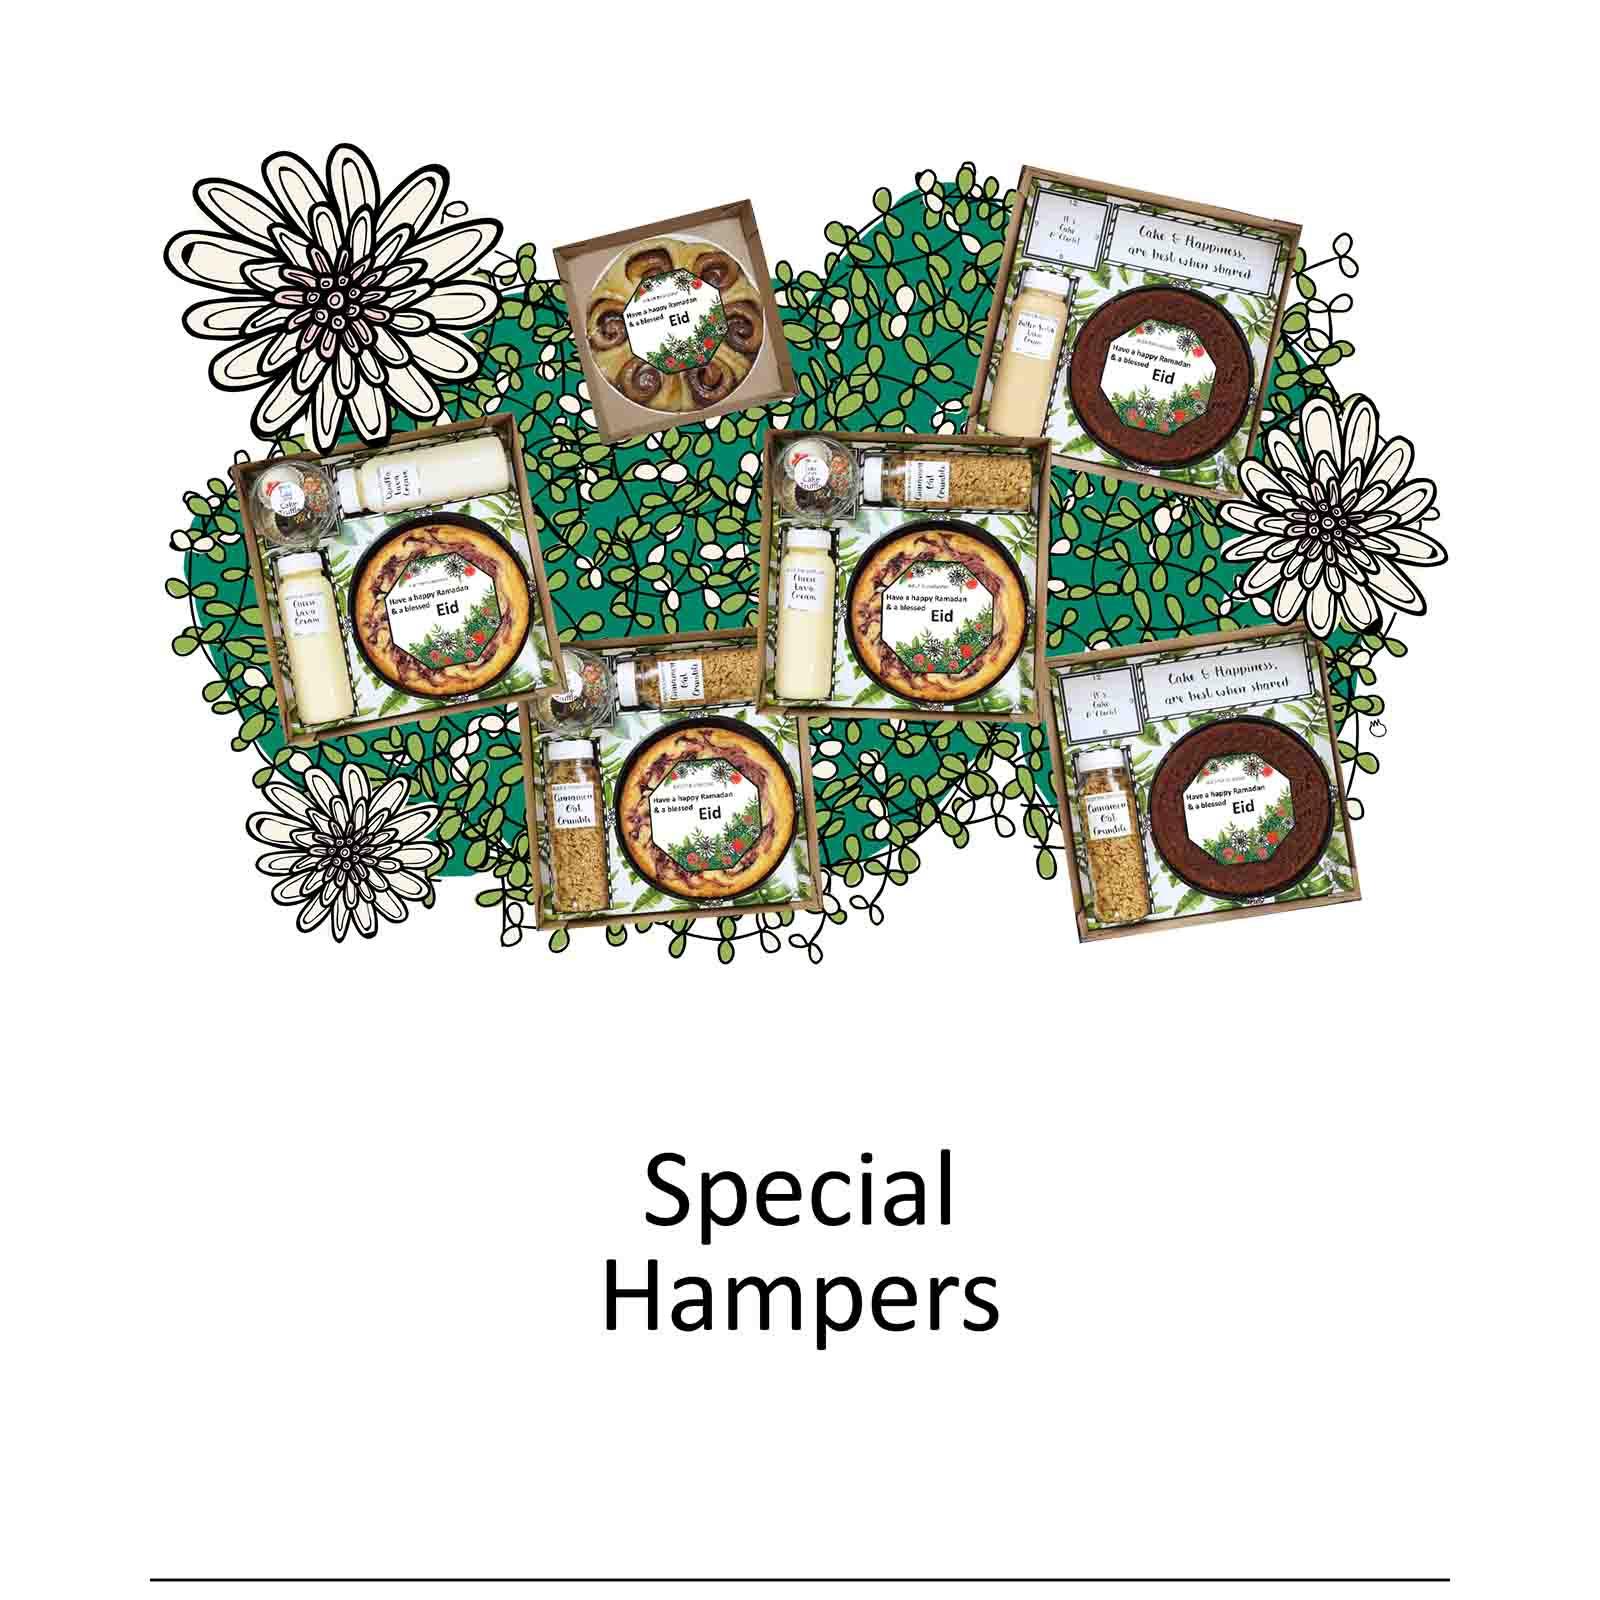 Special Hampers